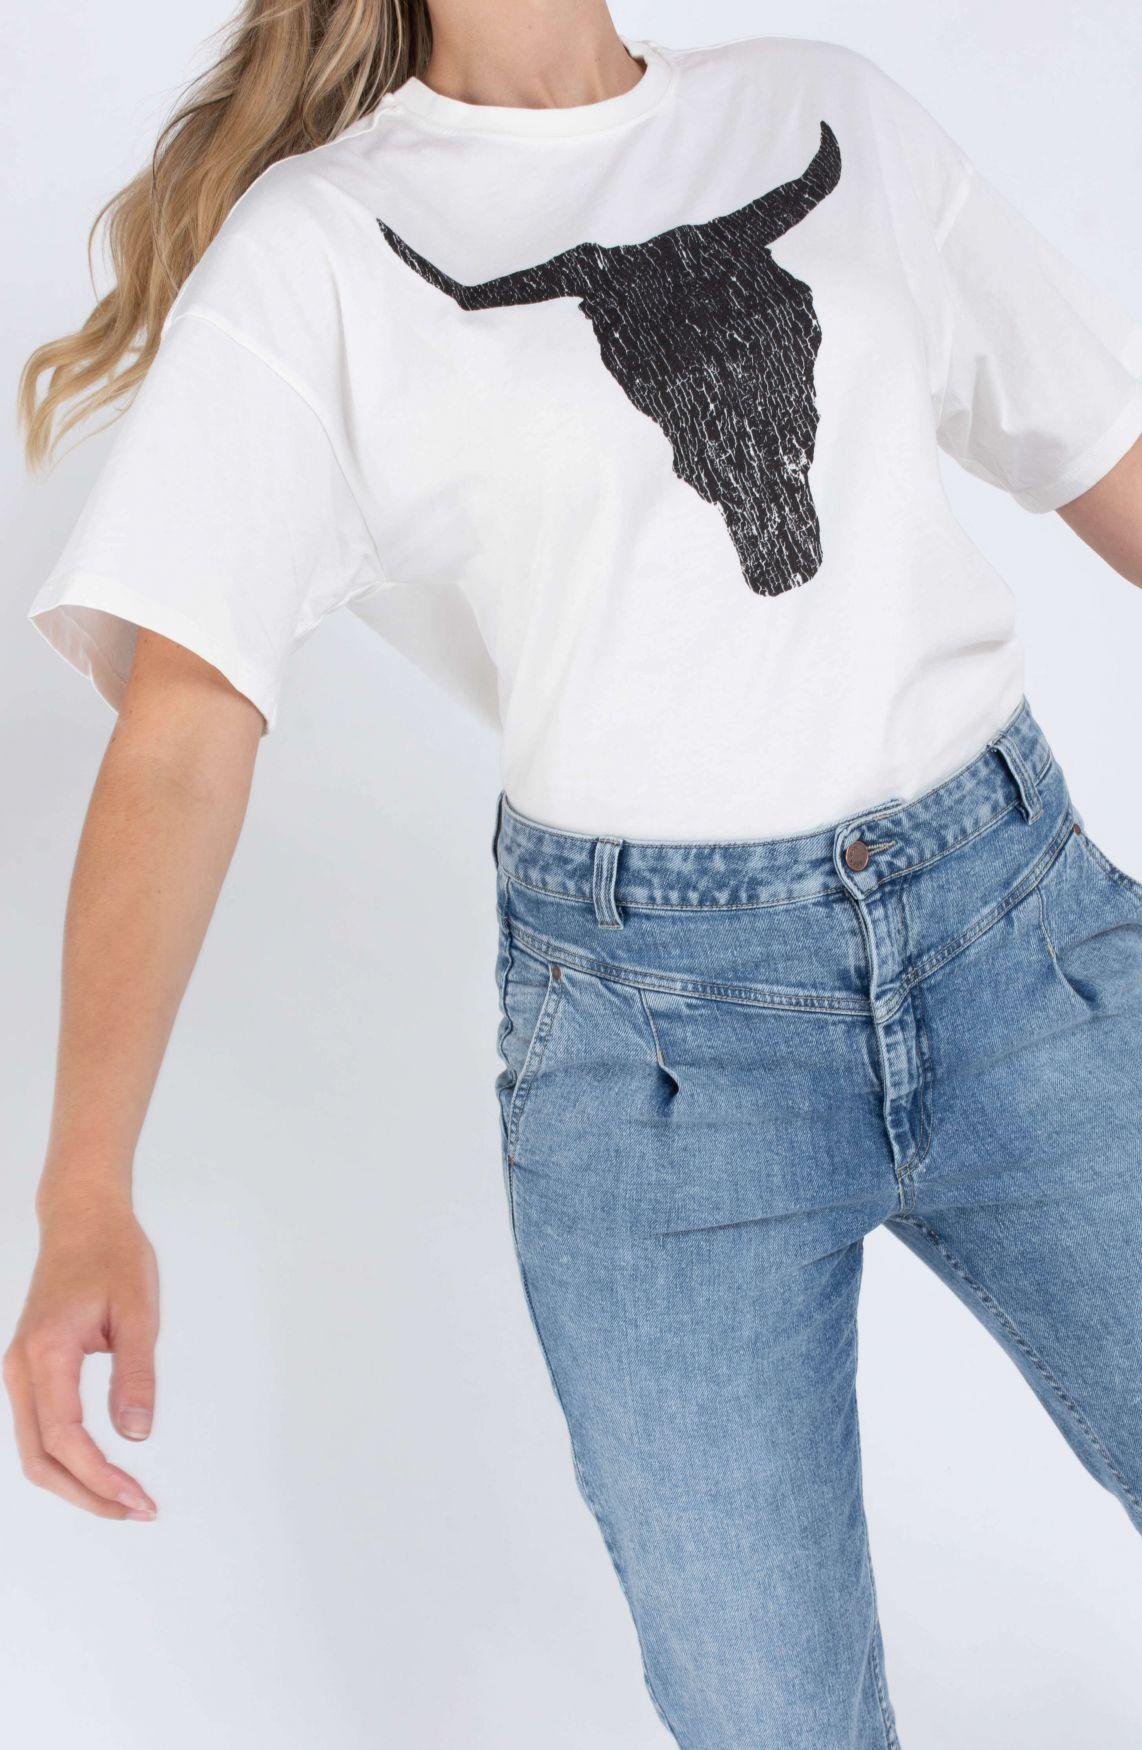 Alix The Label Dames Oversized shirt met print Wit